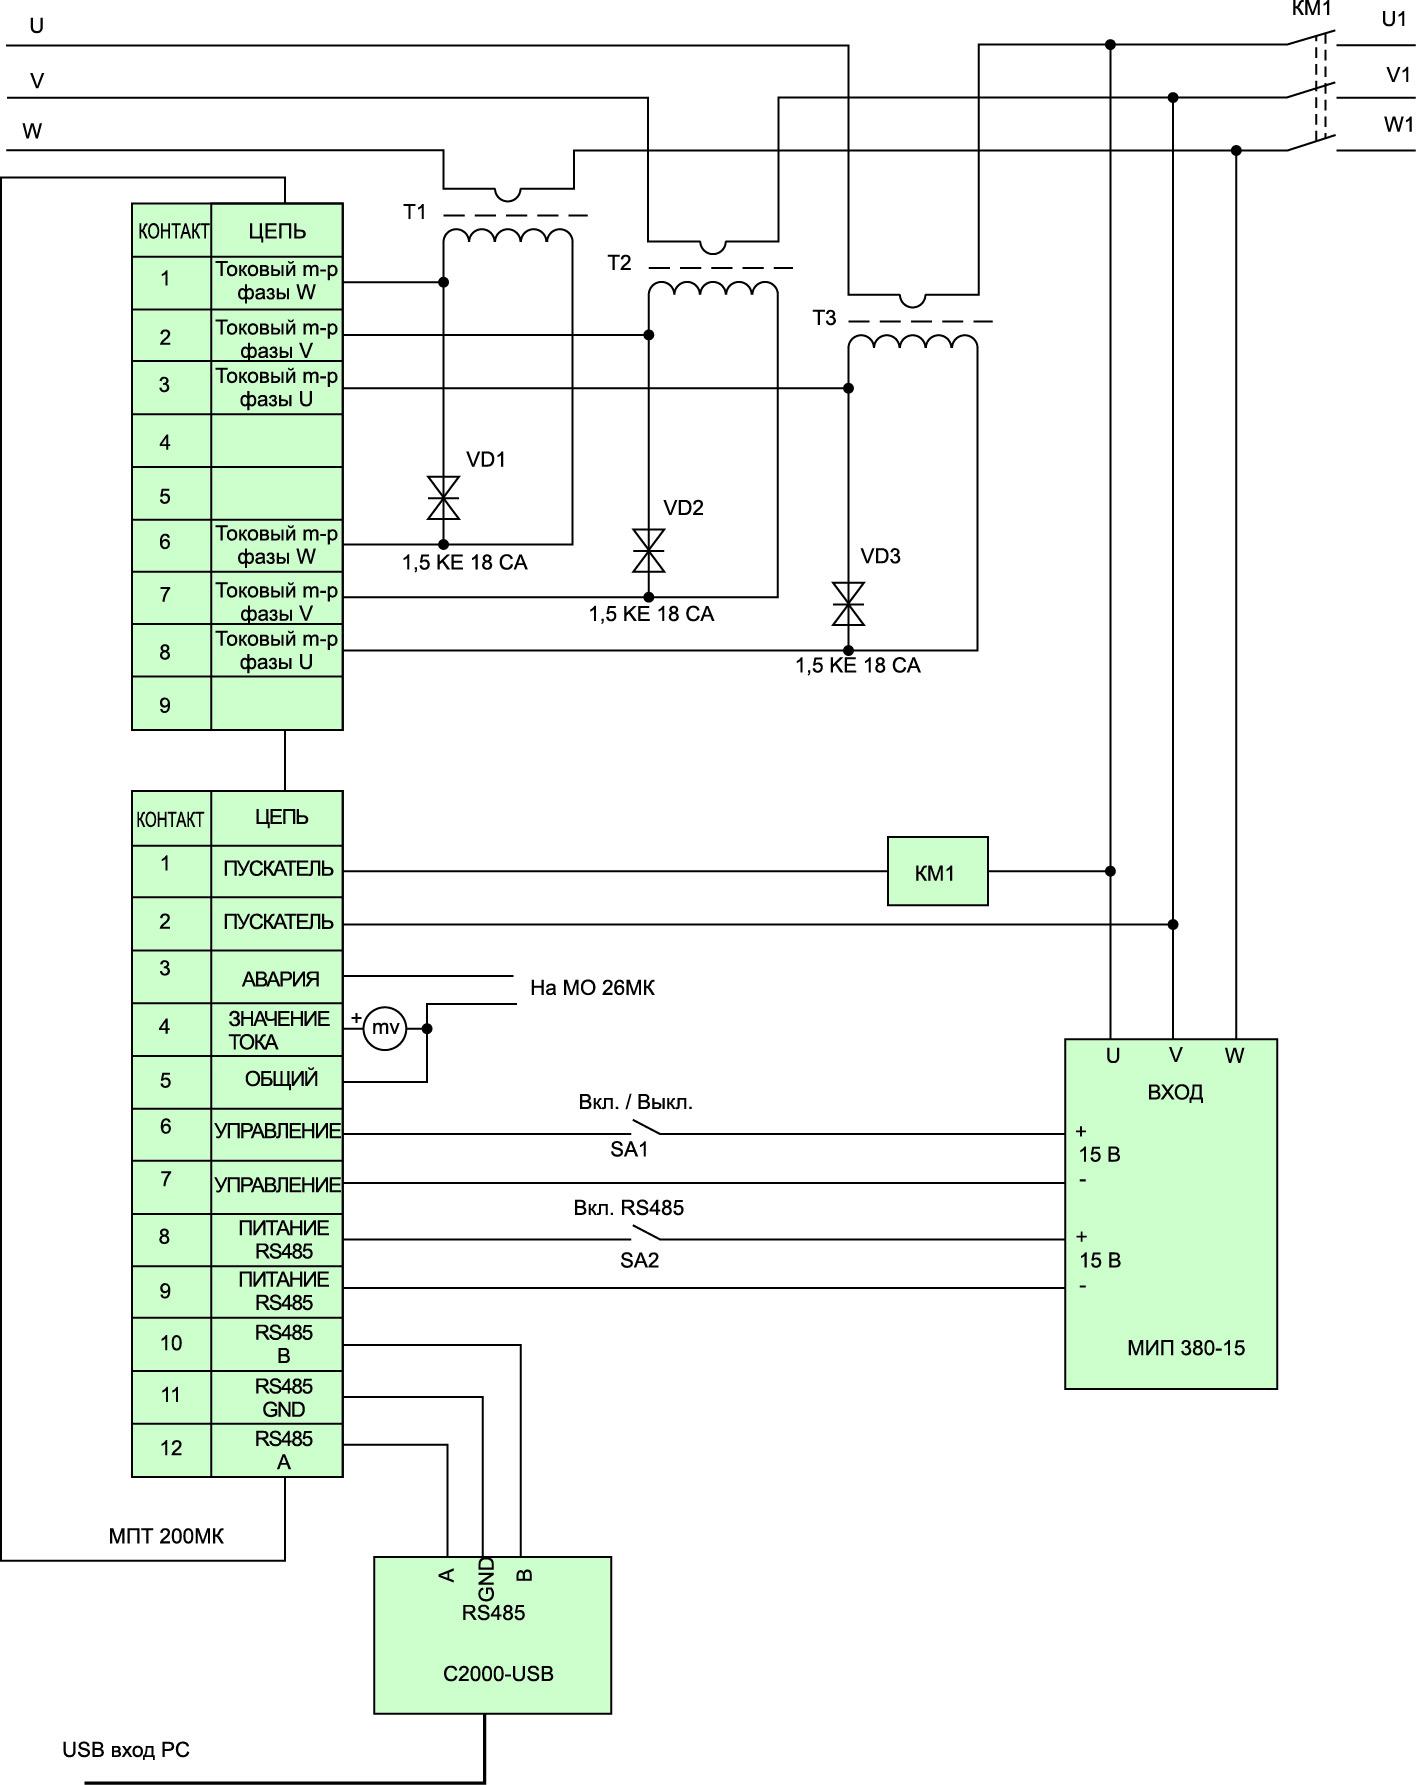 Схема подключения МПТ 200МК